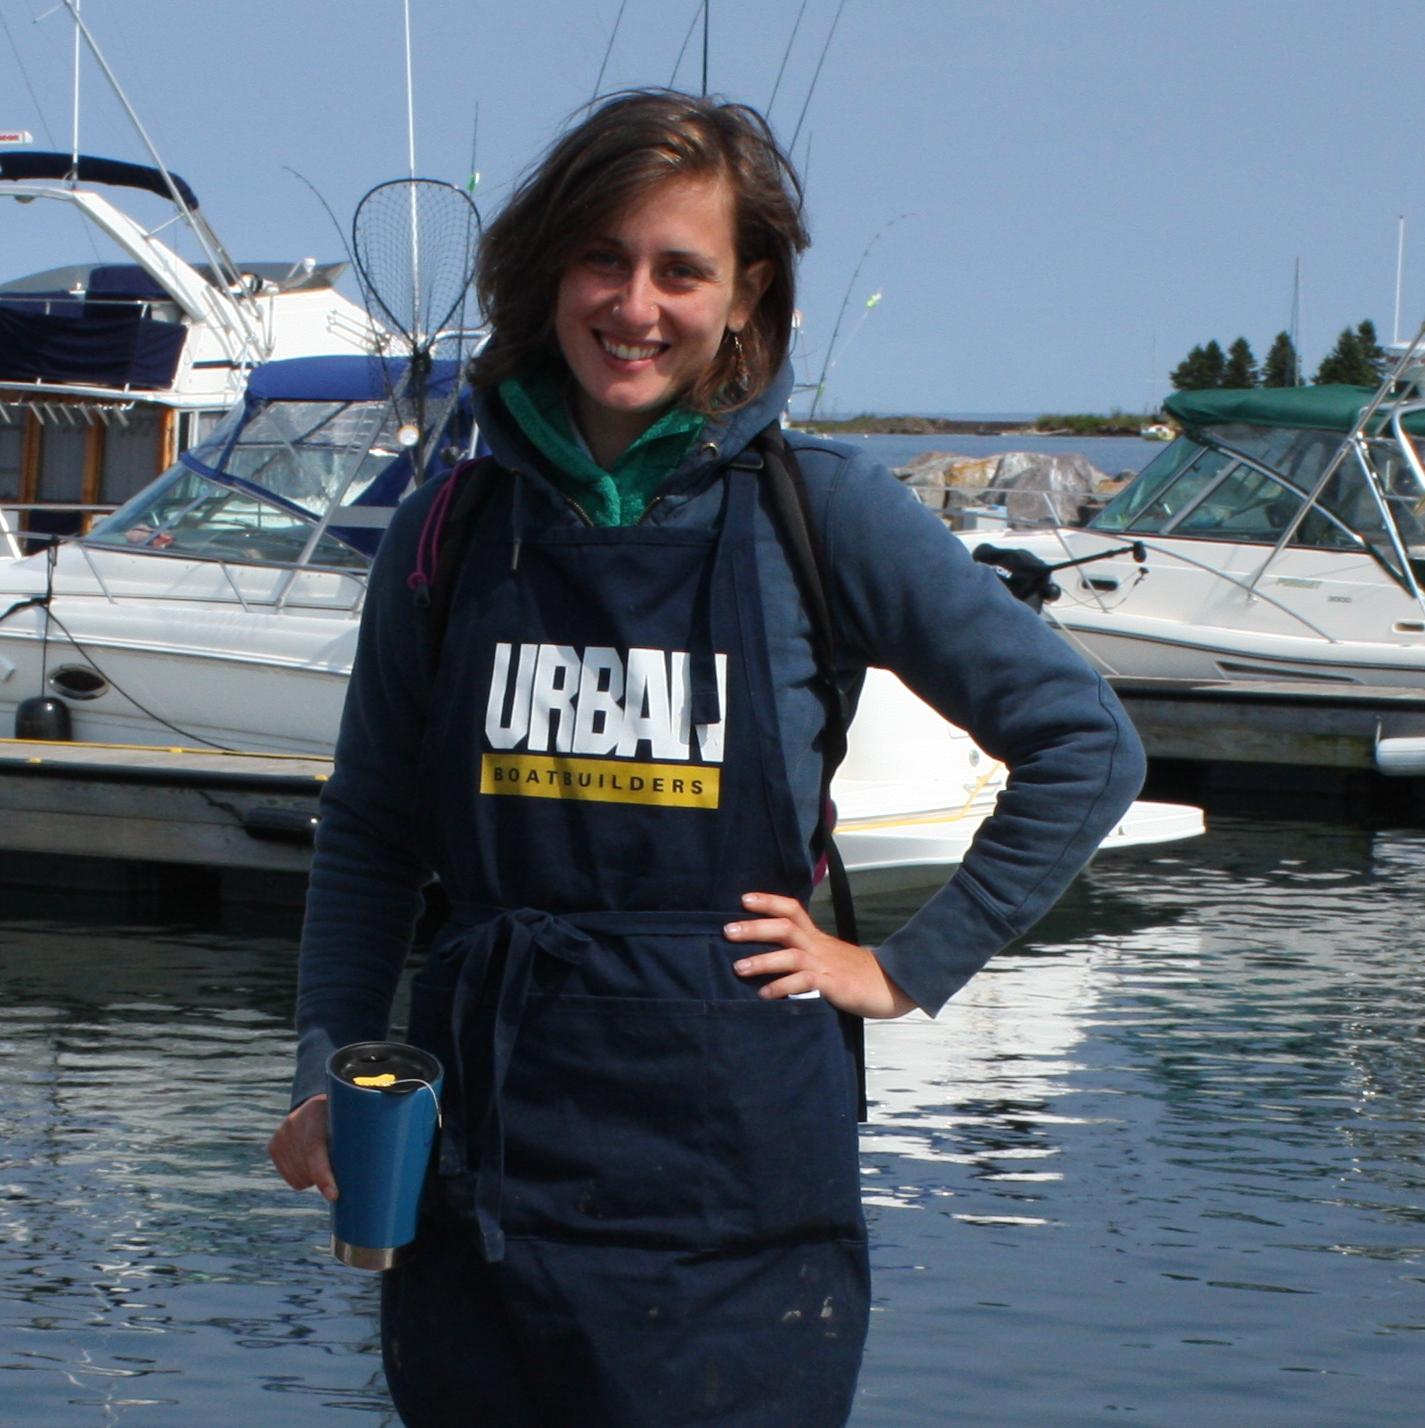 Paddle Minnesota: Urban Boat Builders